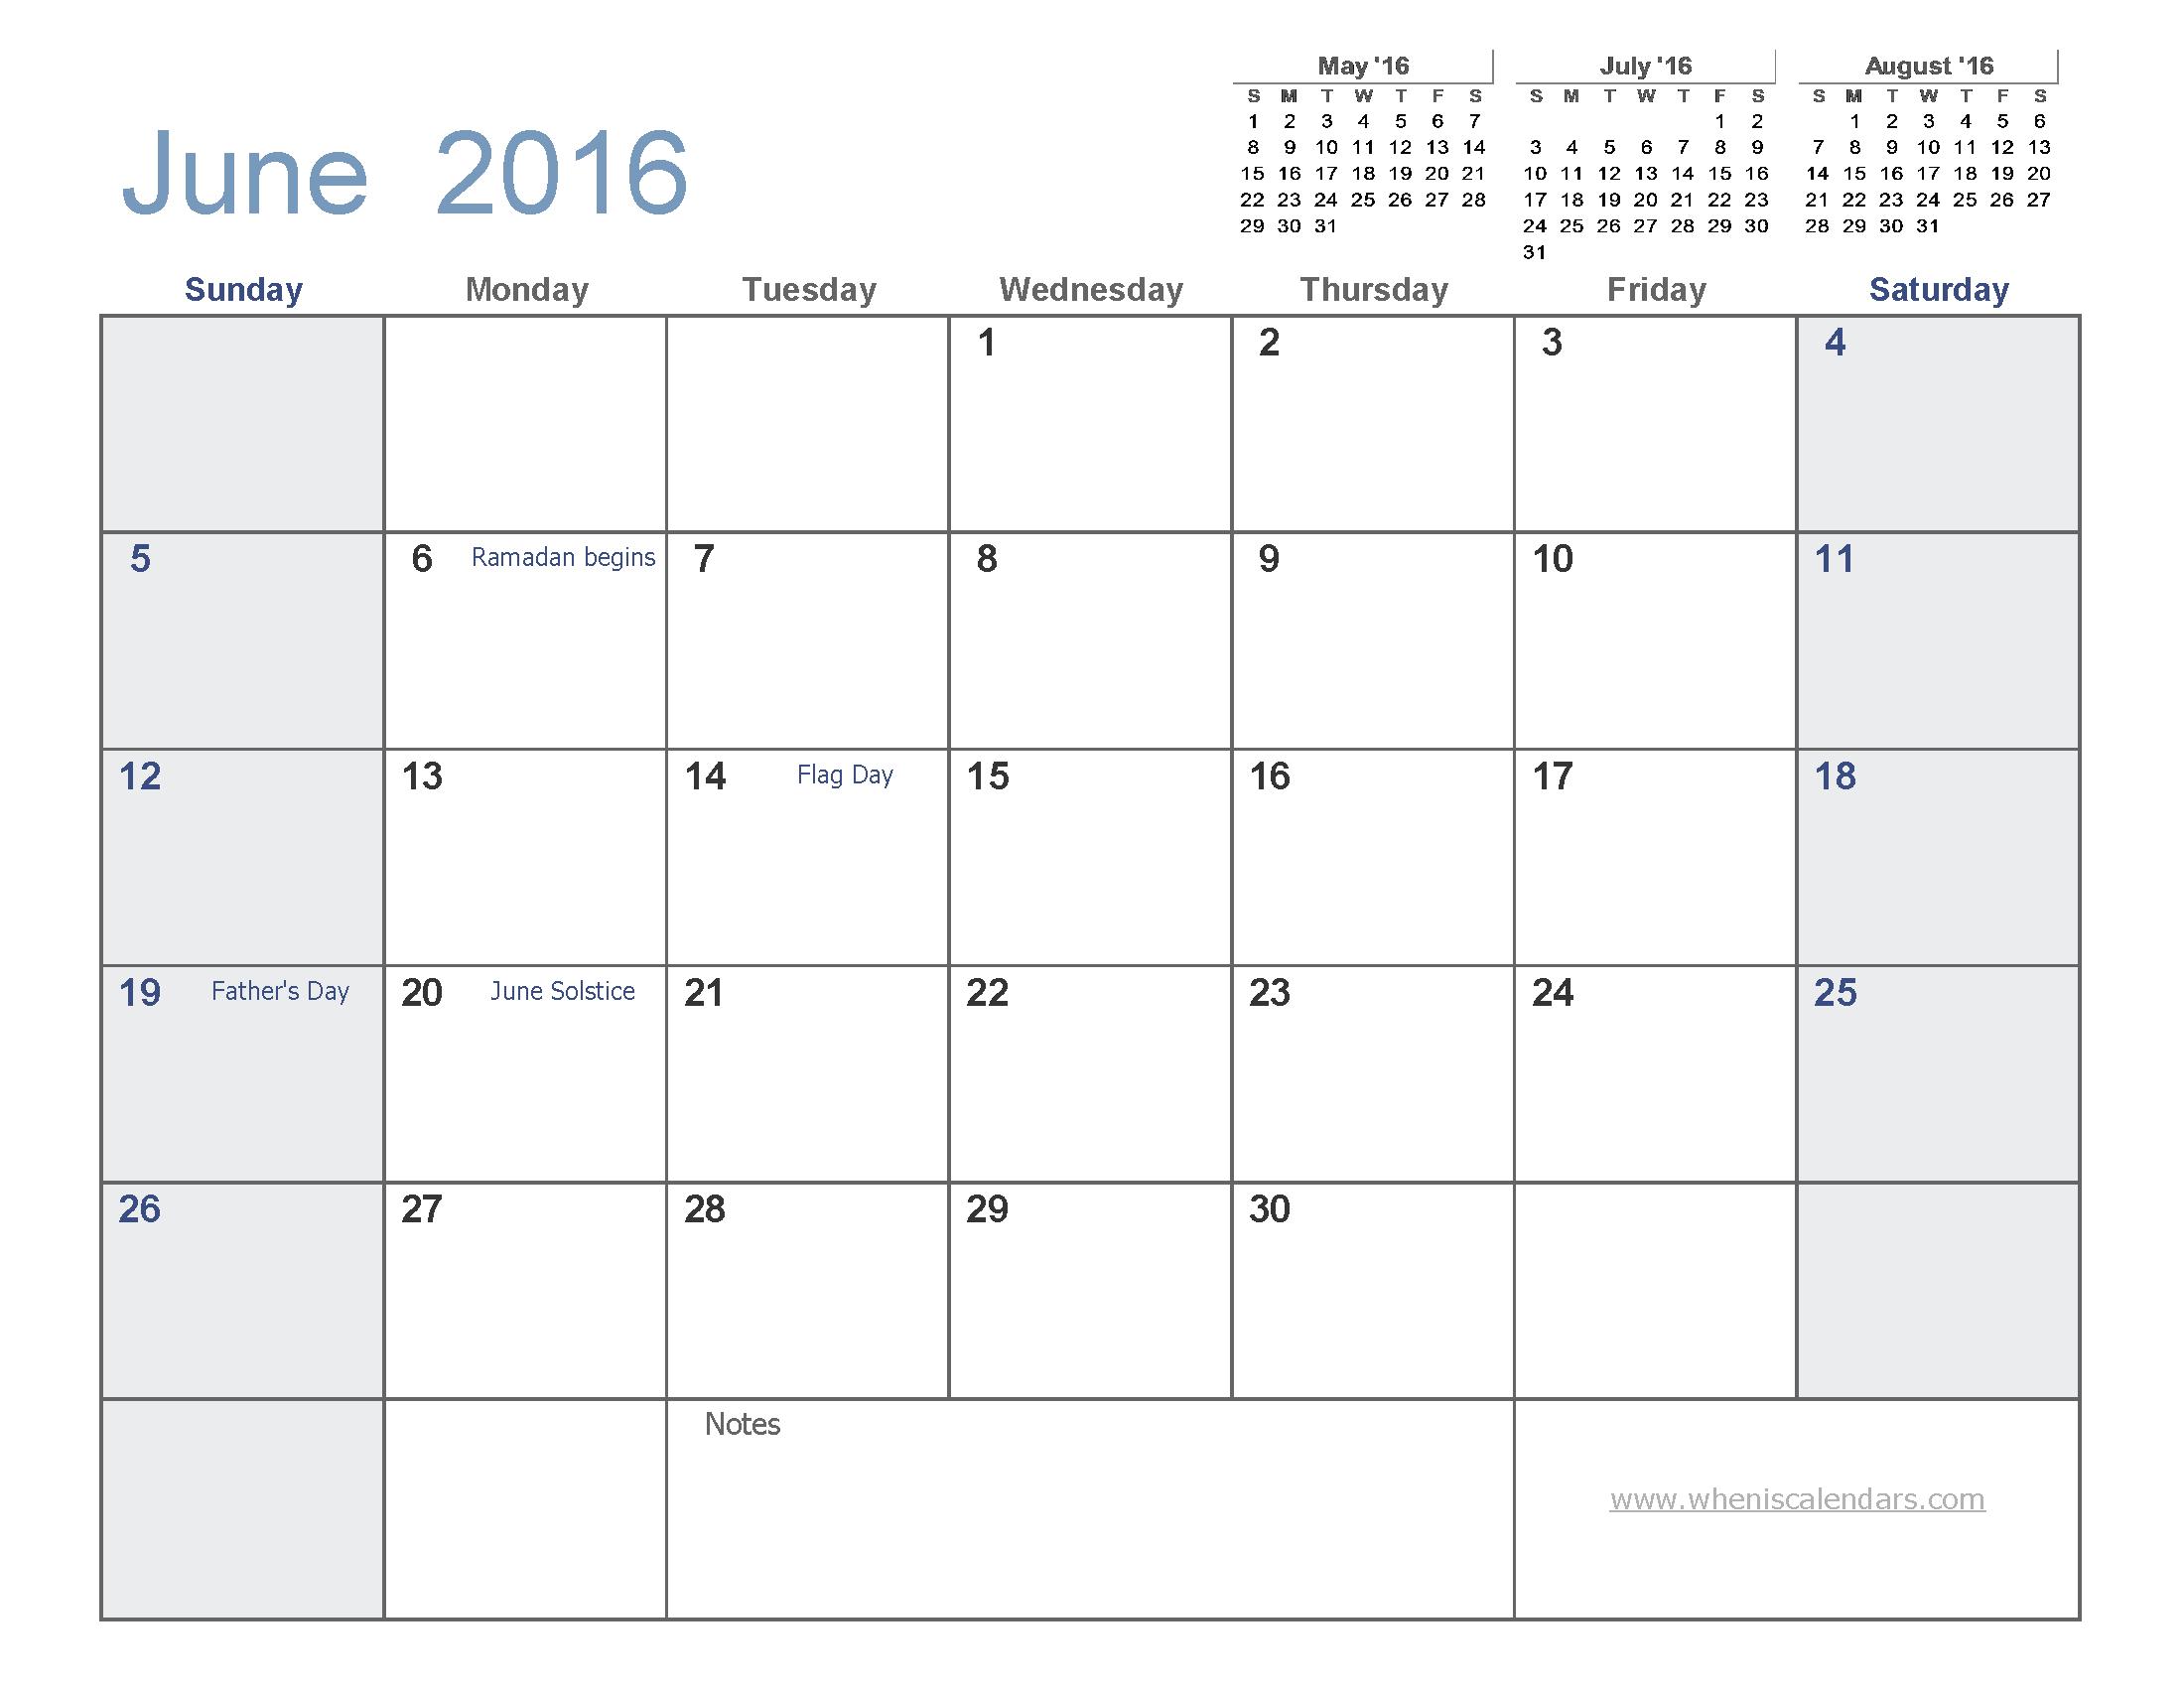 039 June Calendar With Holidays Blank Template July for July 2016 Calendar With Holidays